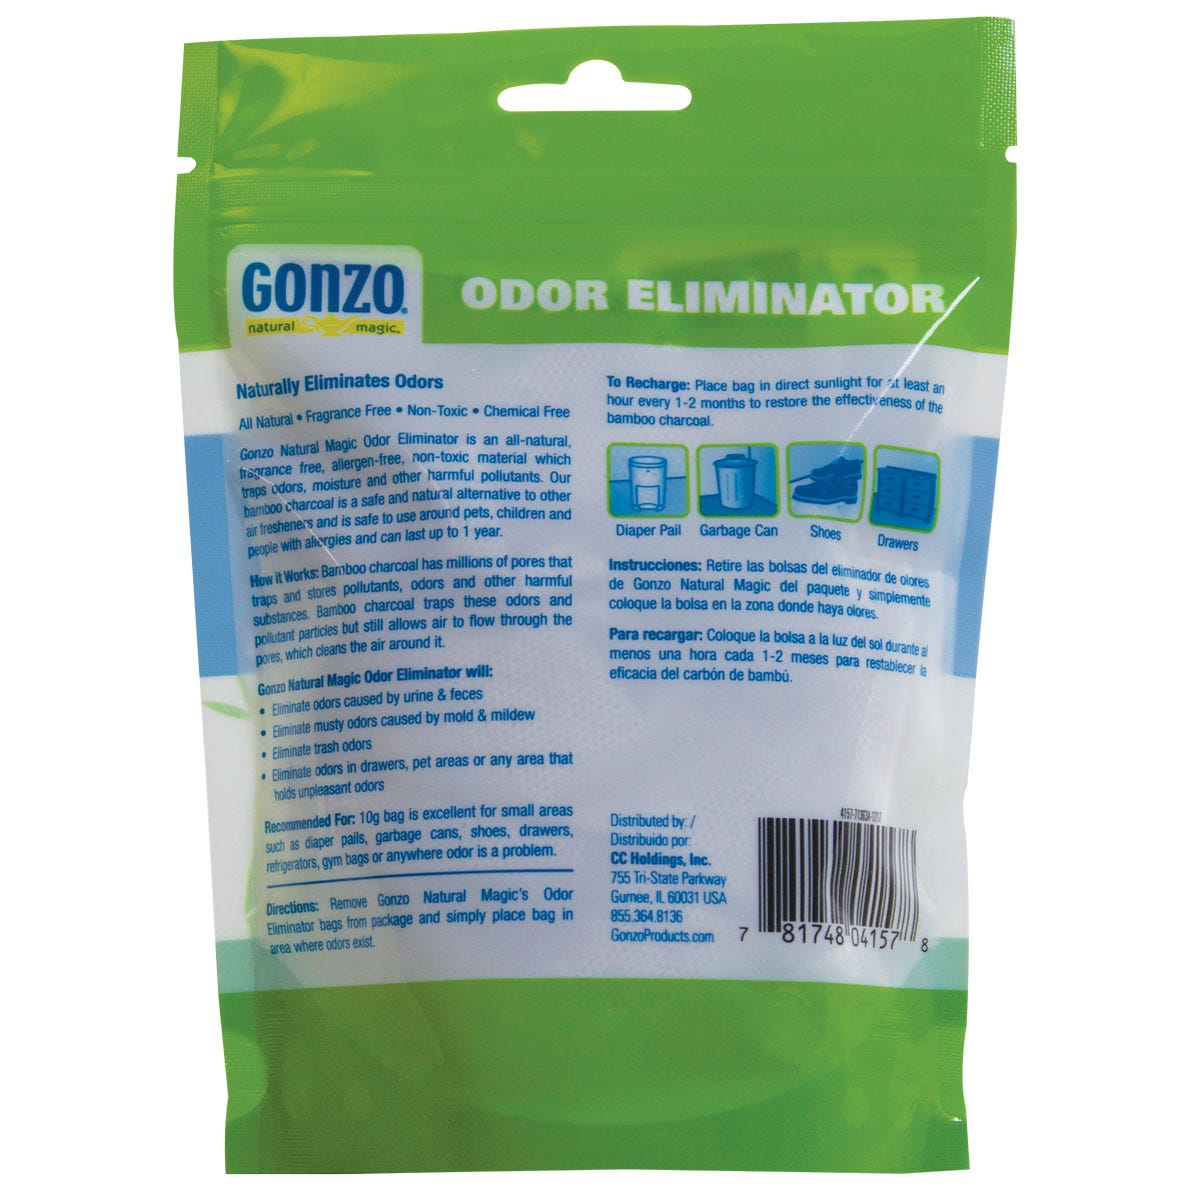 https://googone.com/media/catalog/product/s/h/shoe-odor-eliminator_back.jpg